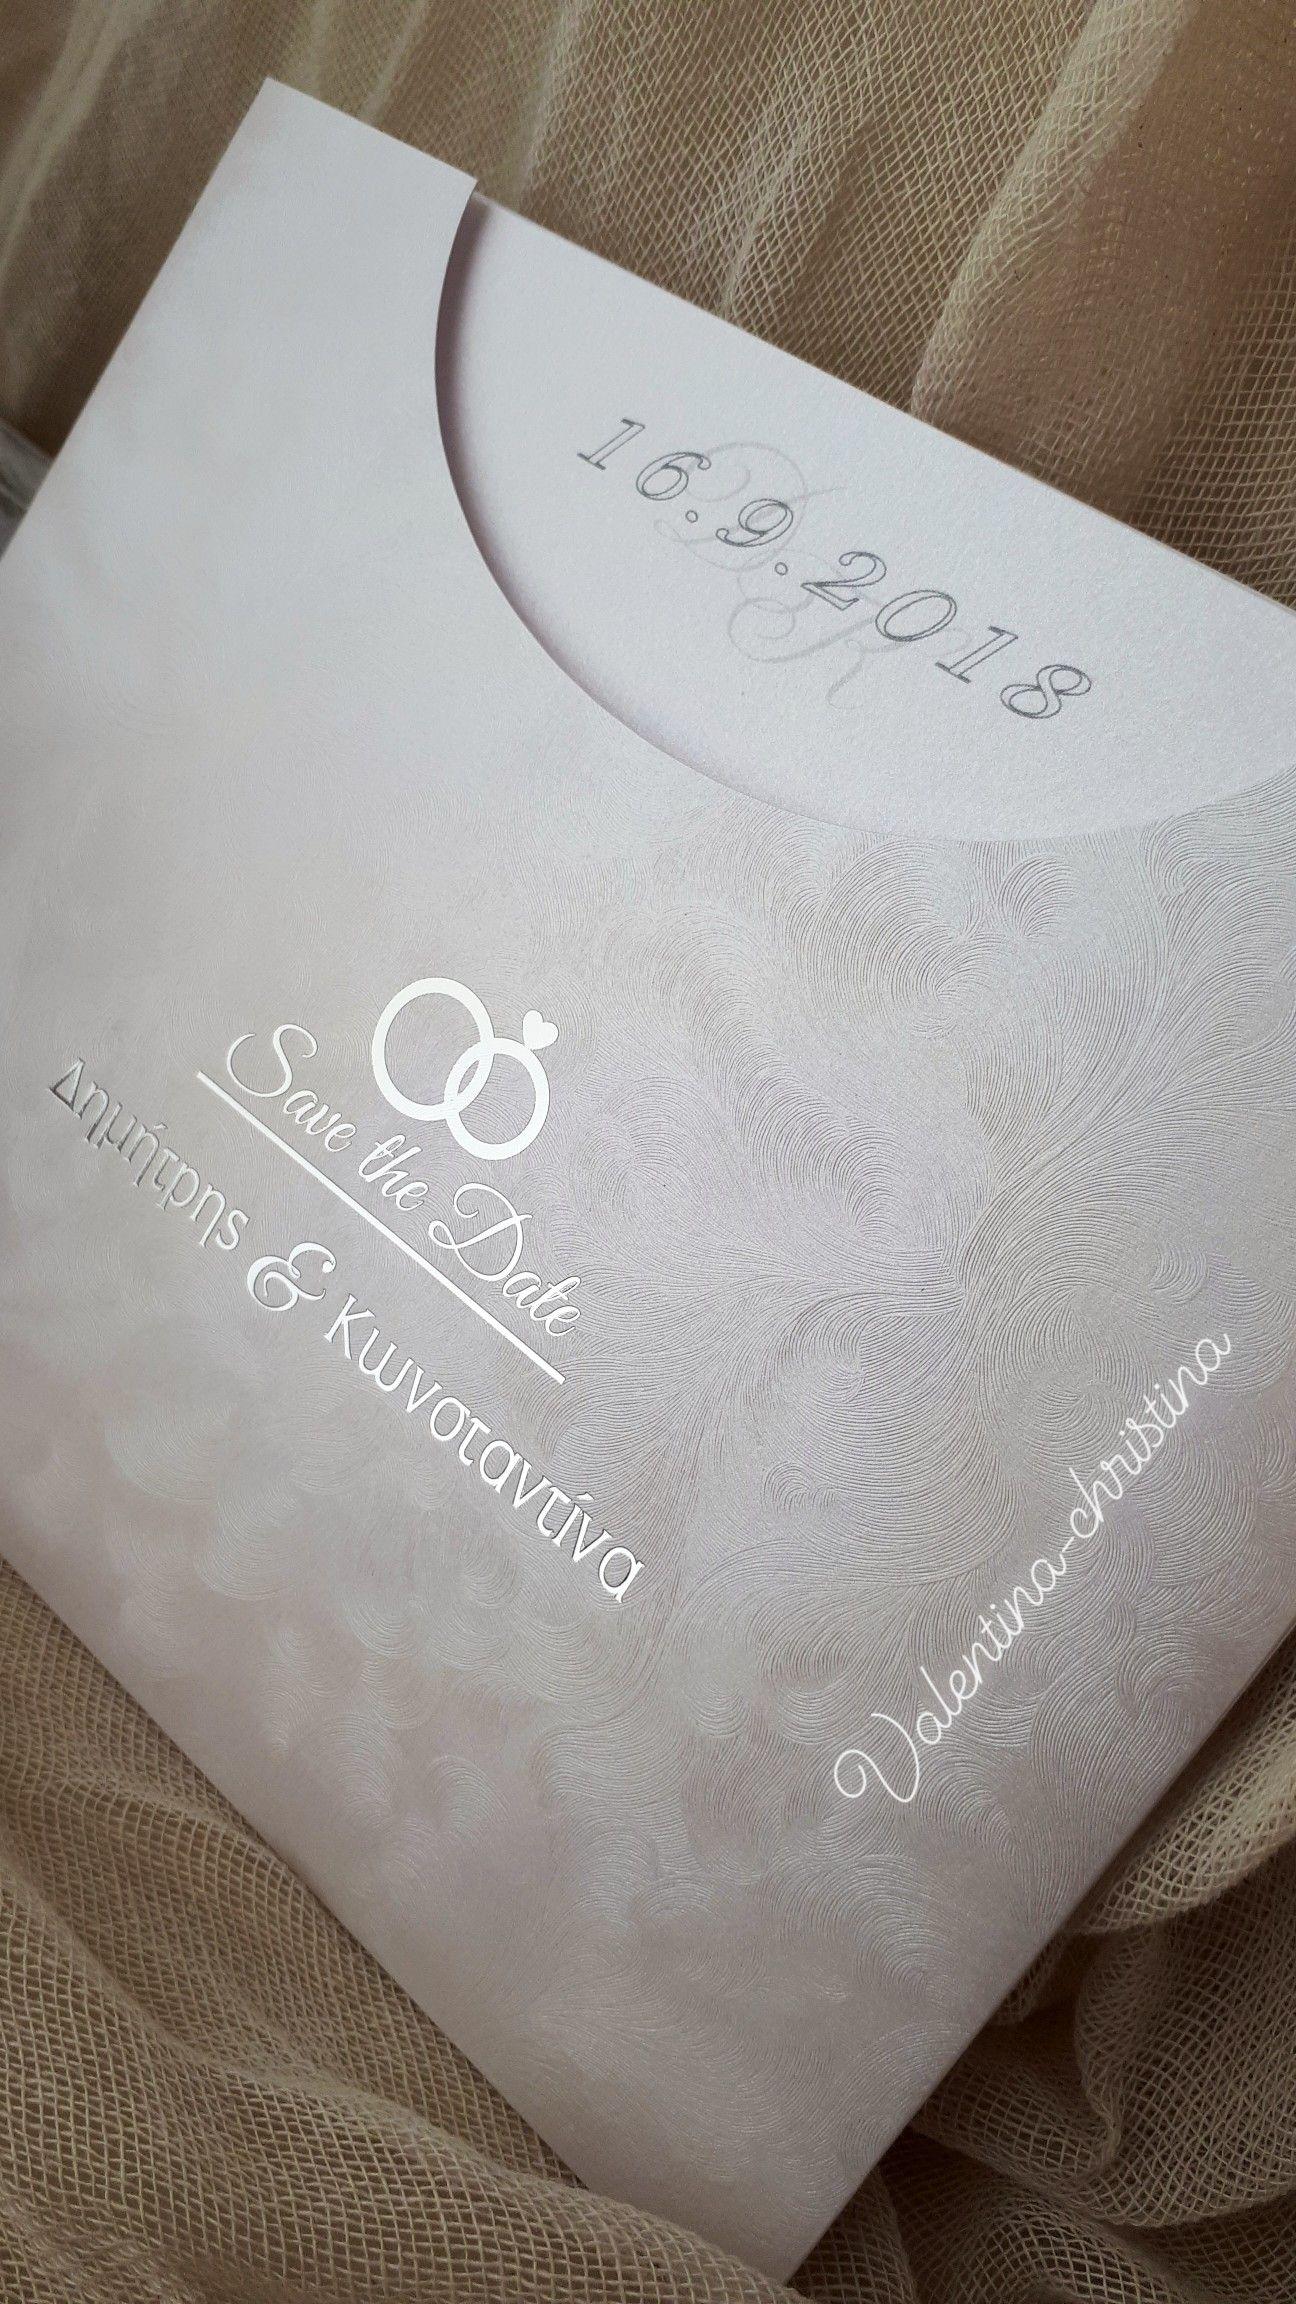 8063b04aad36 Μοναδικής ποιότητας και αισθητικής η επιλογή του χαρτιού για το προσκλητήριο  γάμου σας!by valentina